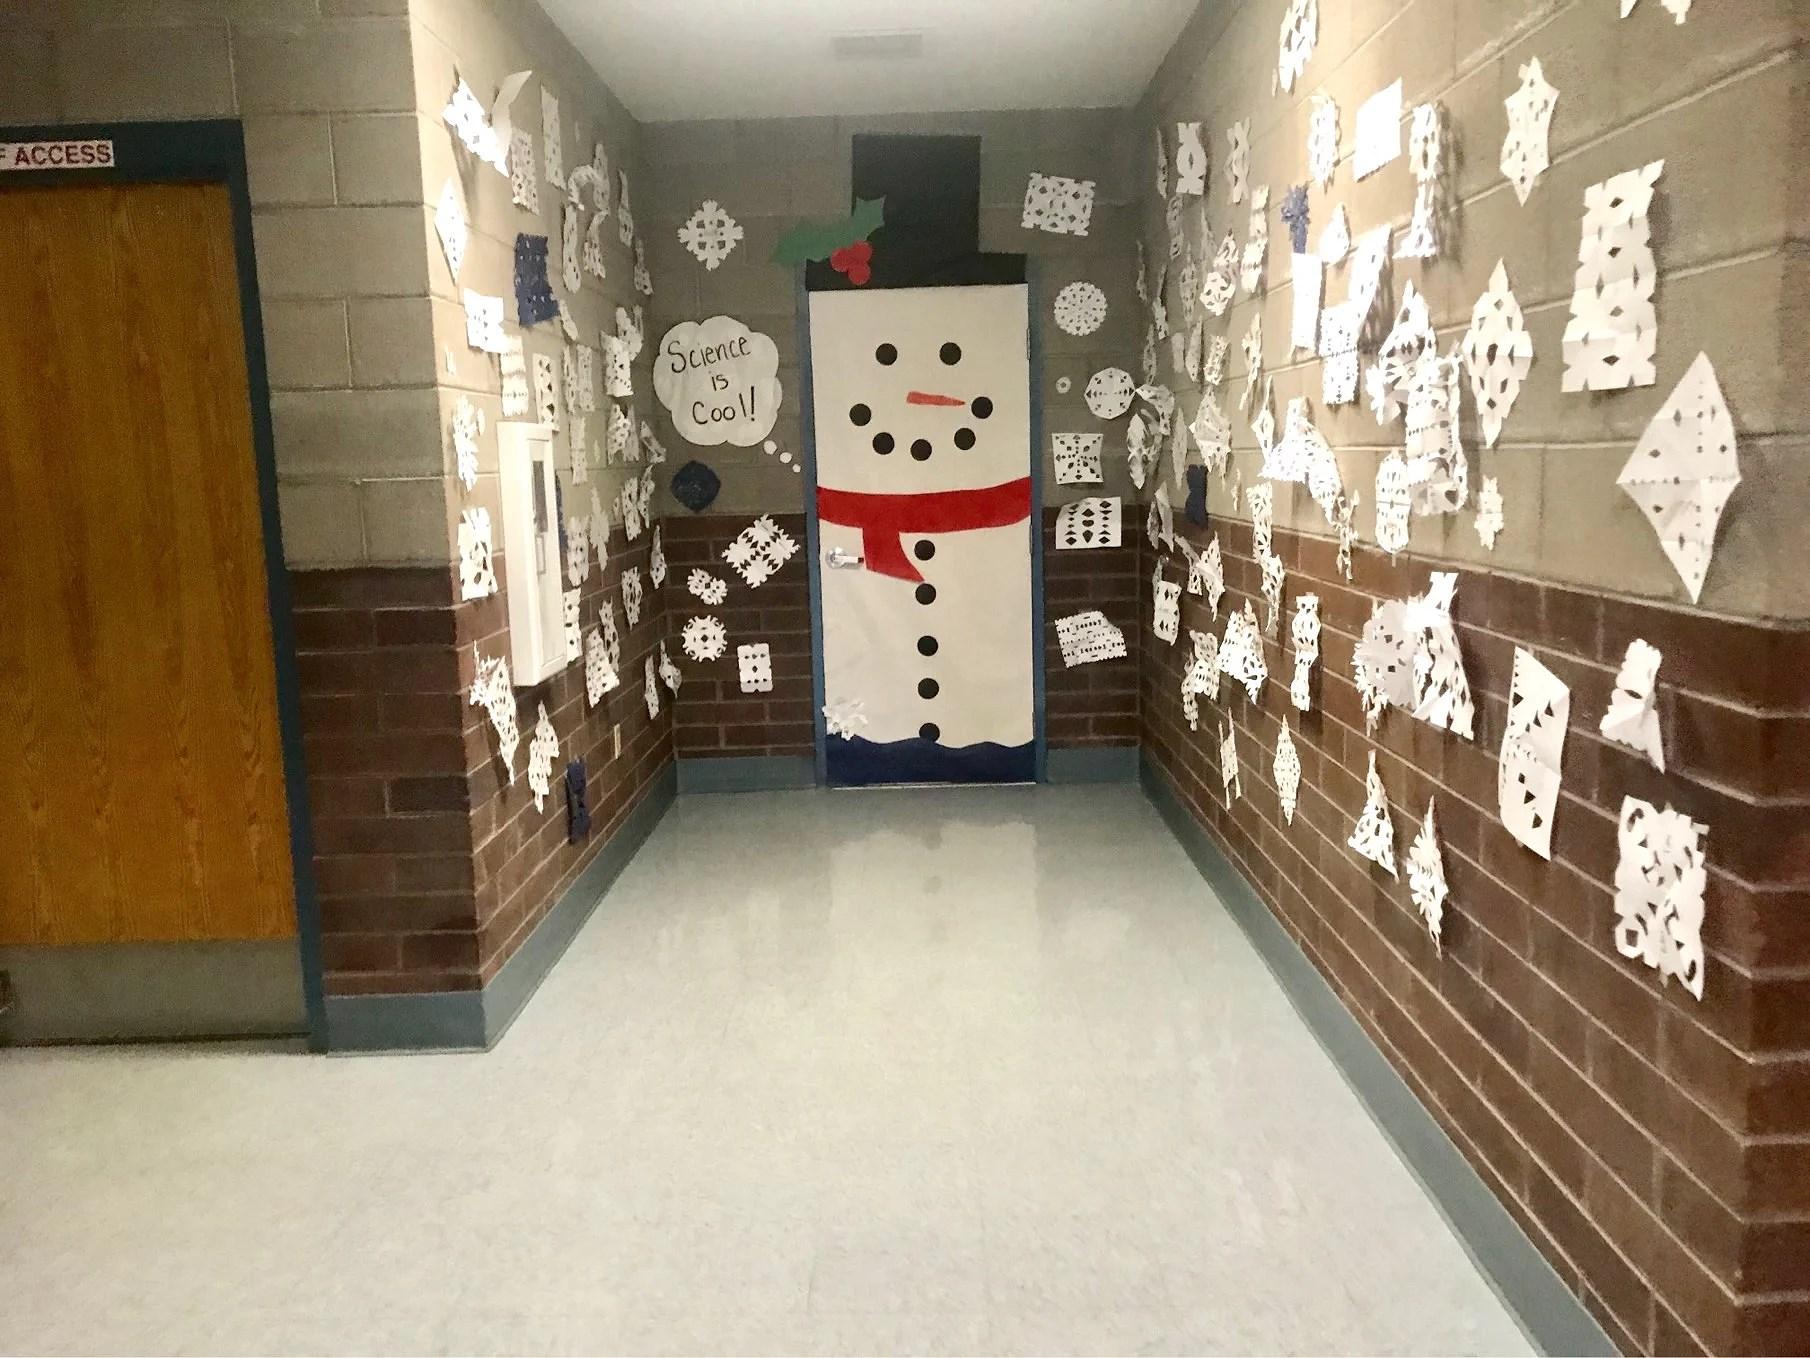 Day 142 - Doors decorations